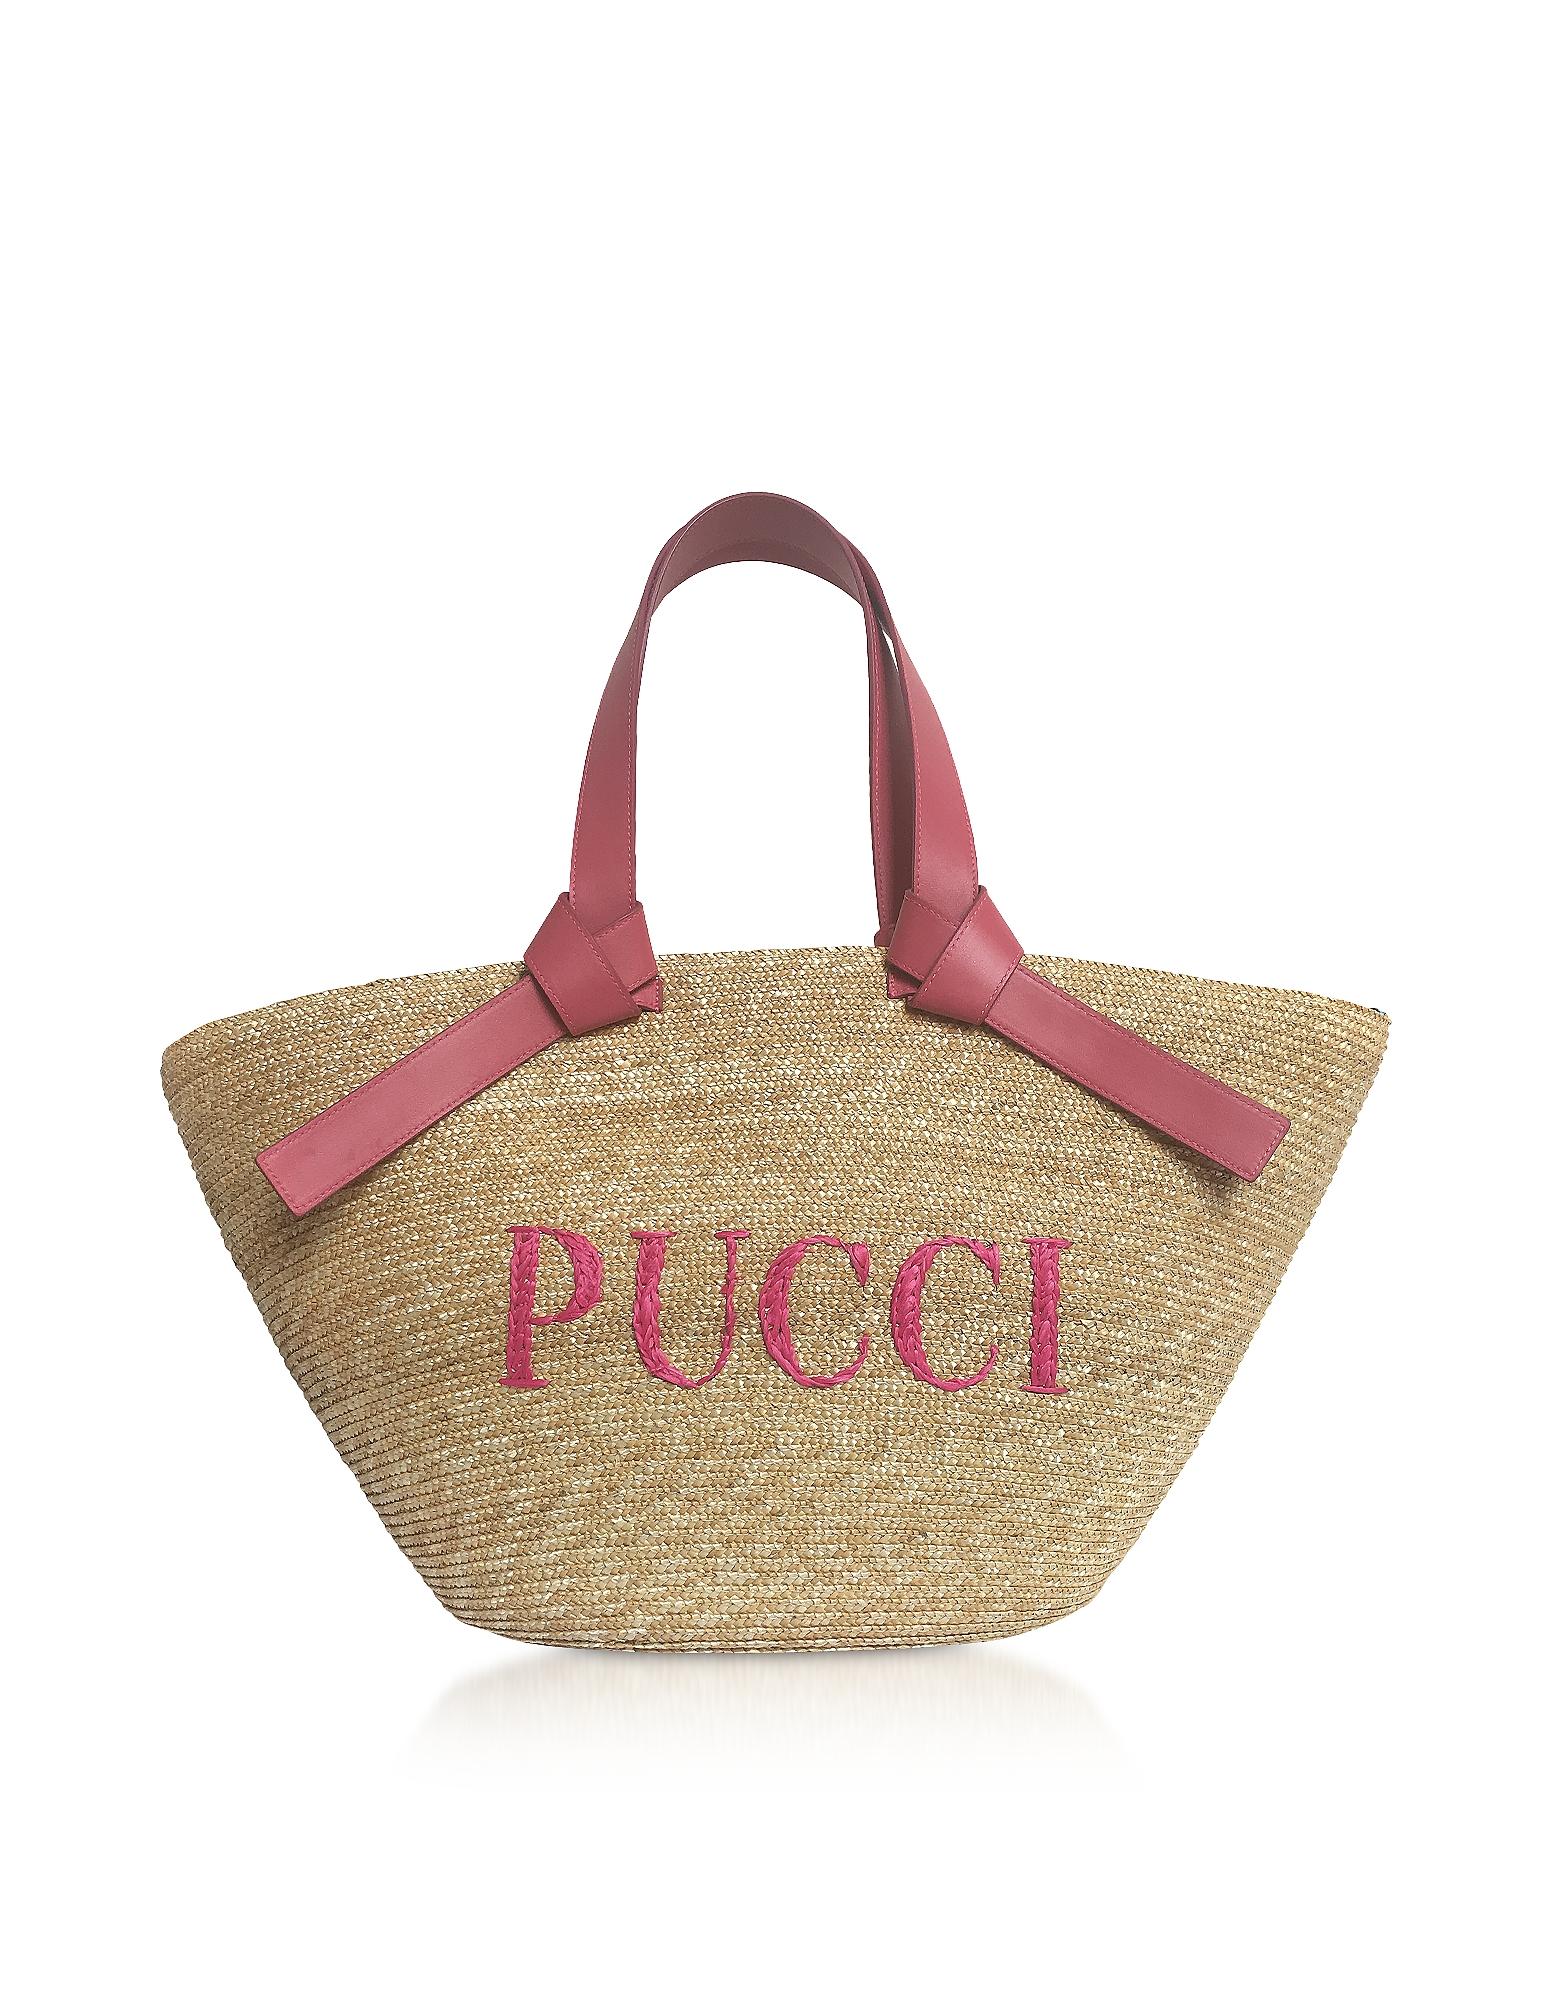 Emilio Pucci Handbags, Raffia Signature Bucket Bag